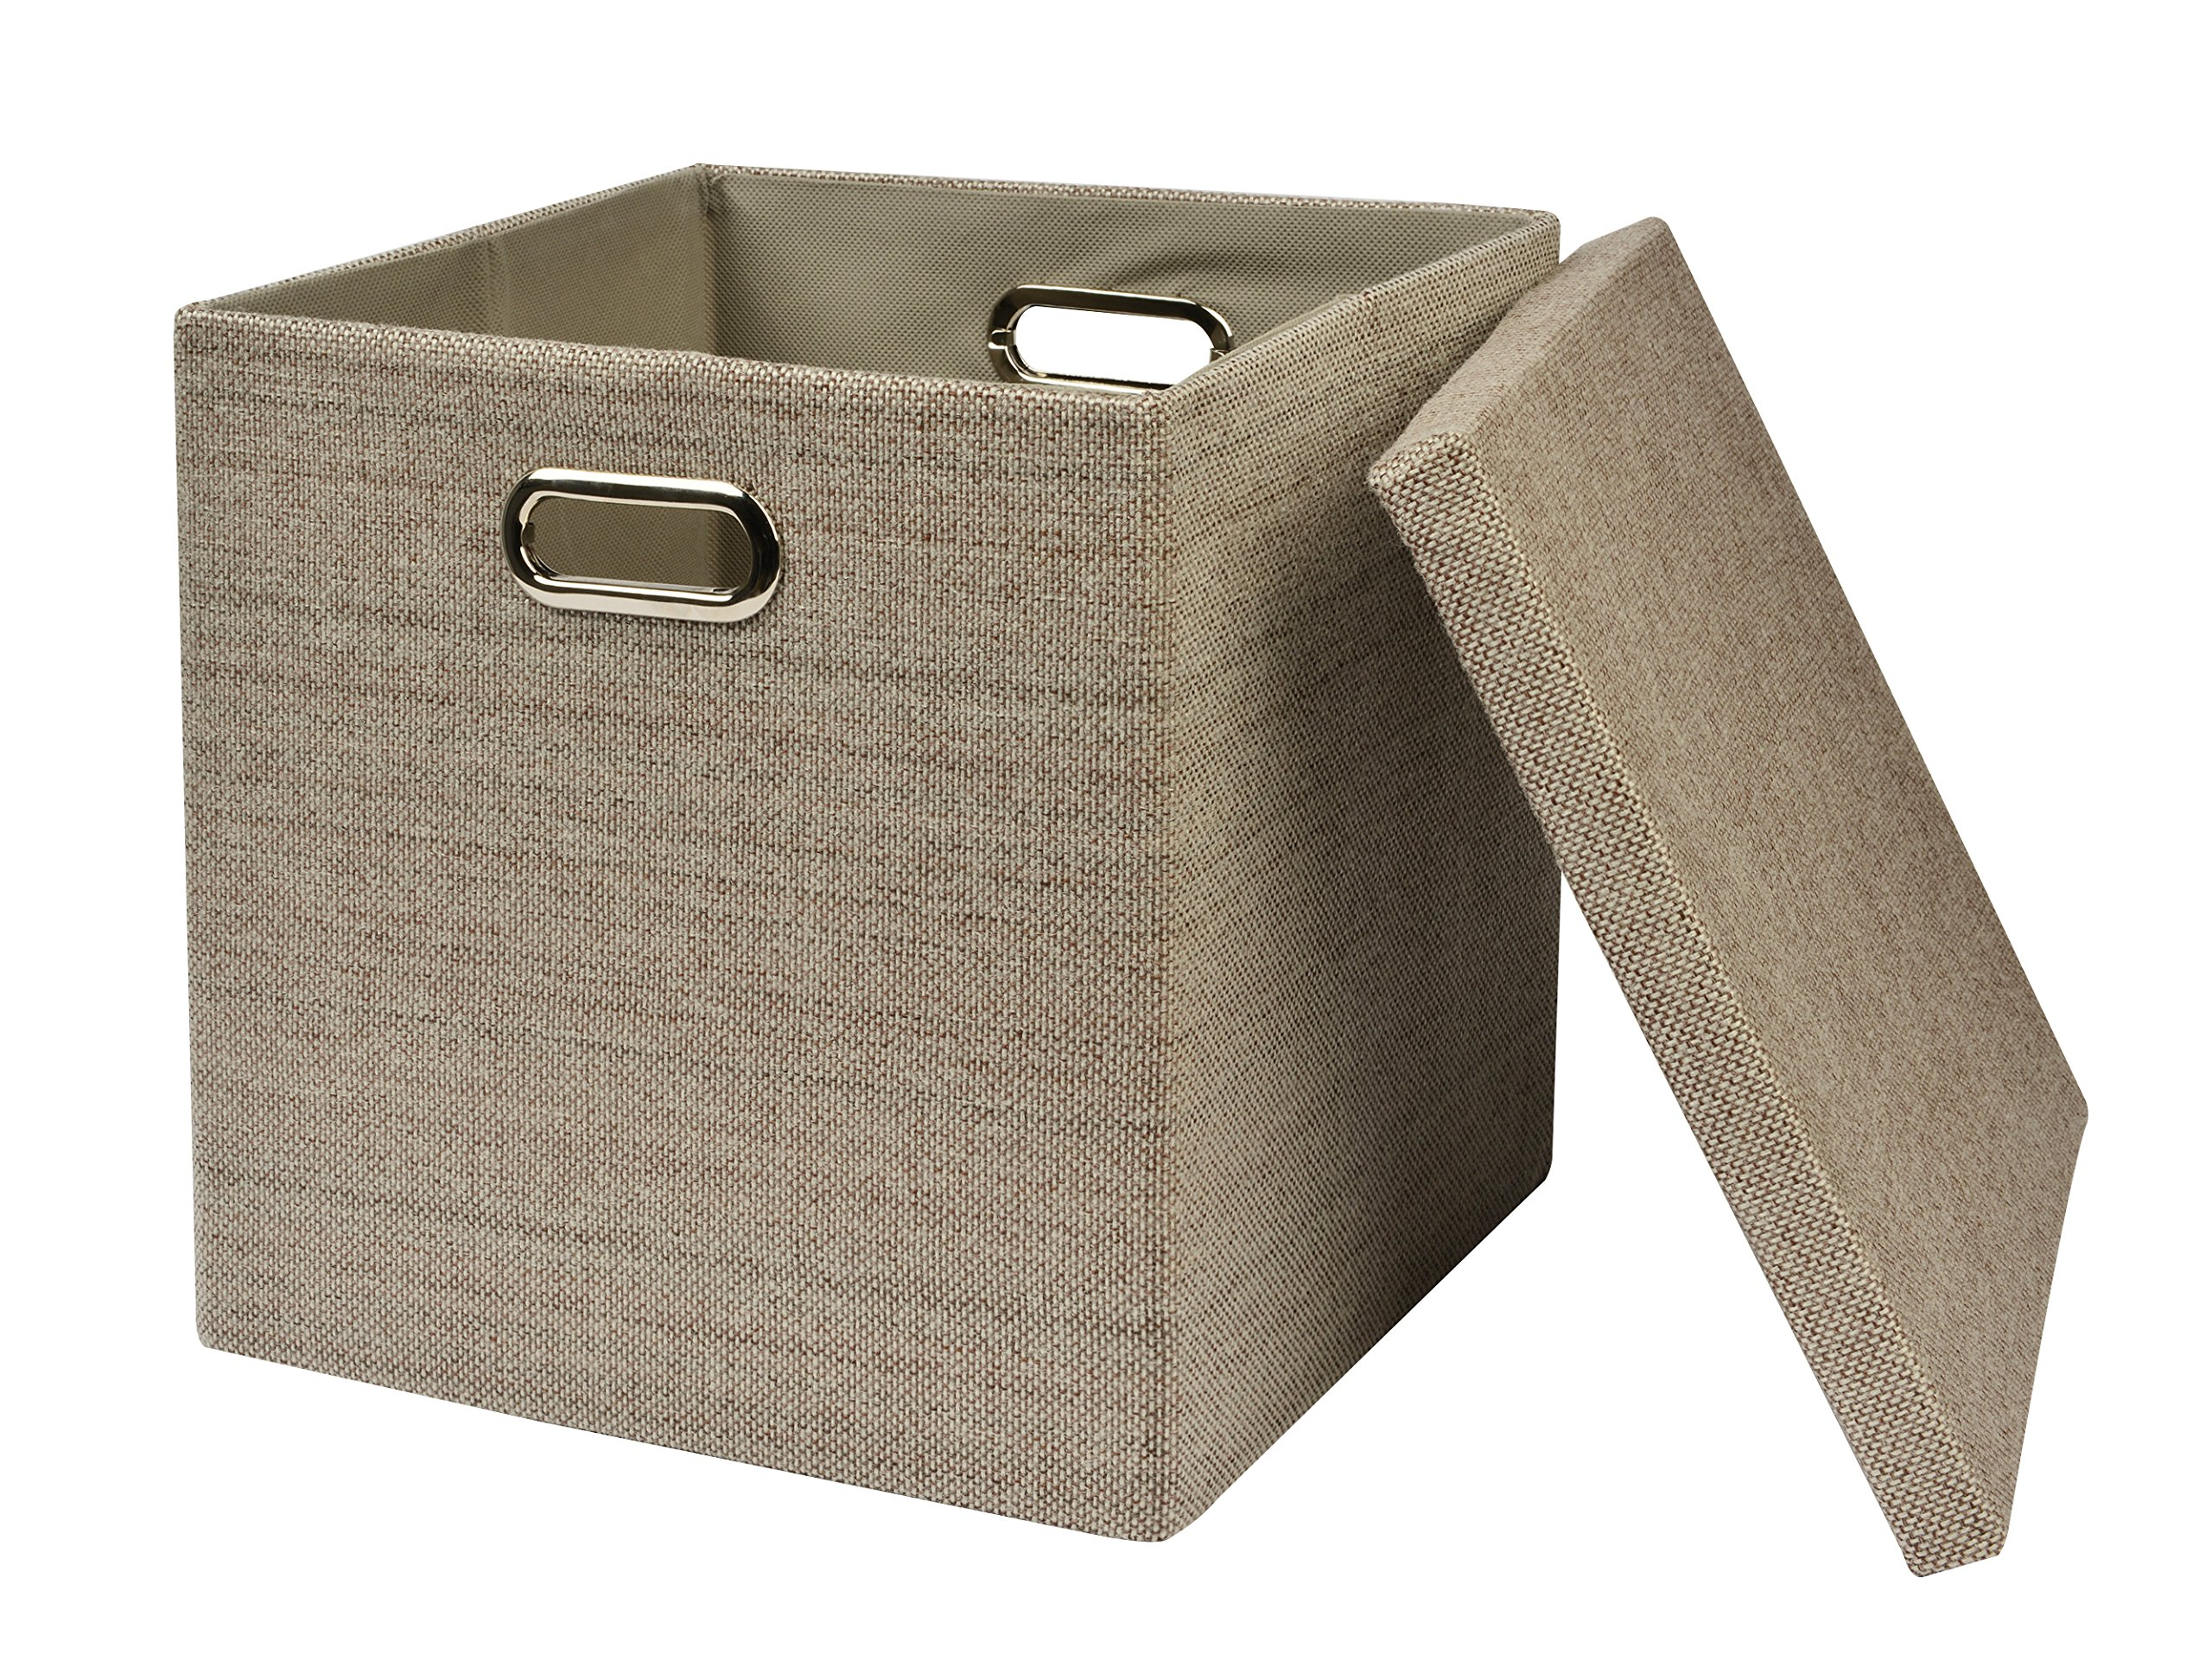 0be0c700efa4 Details about Perber Storage Bins Foldable 13x13x13